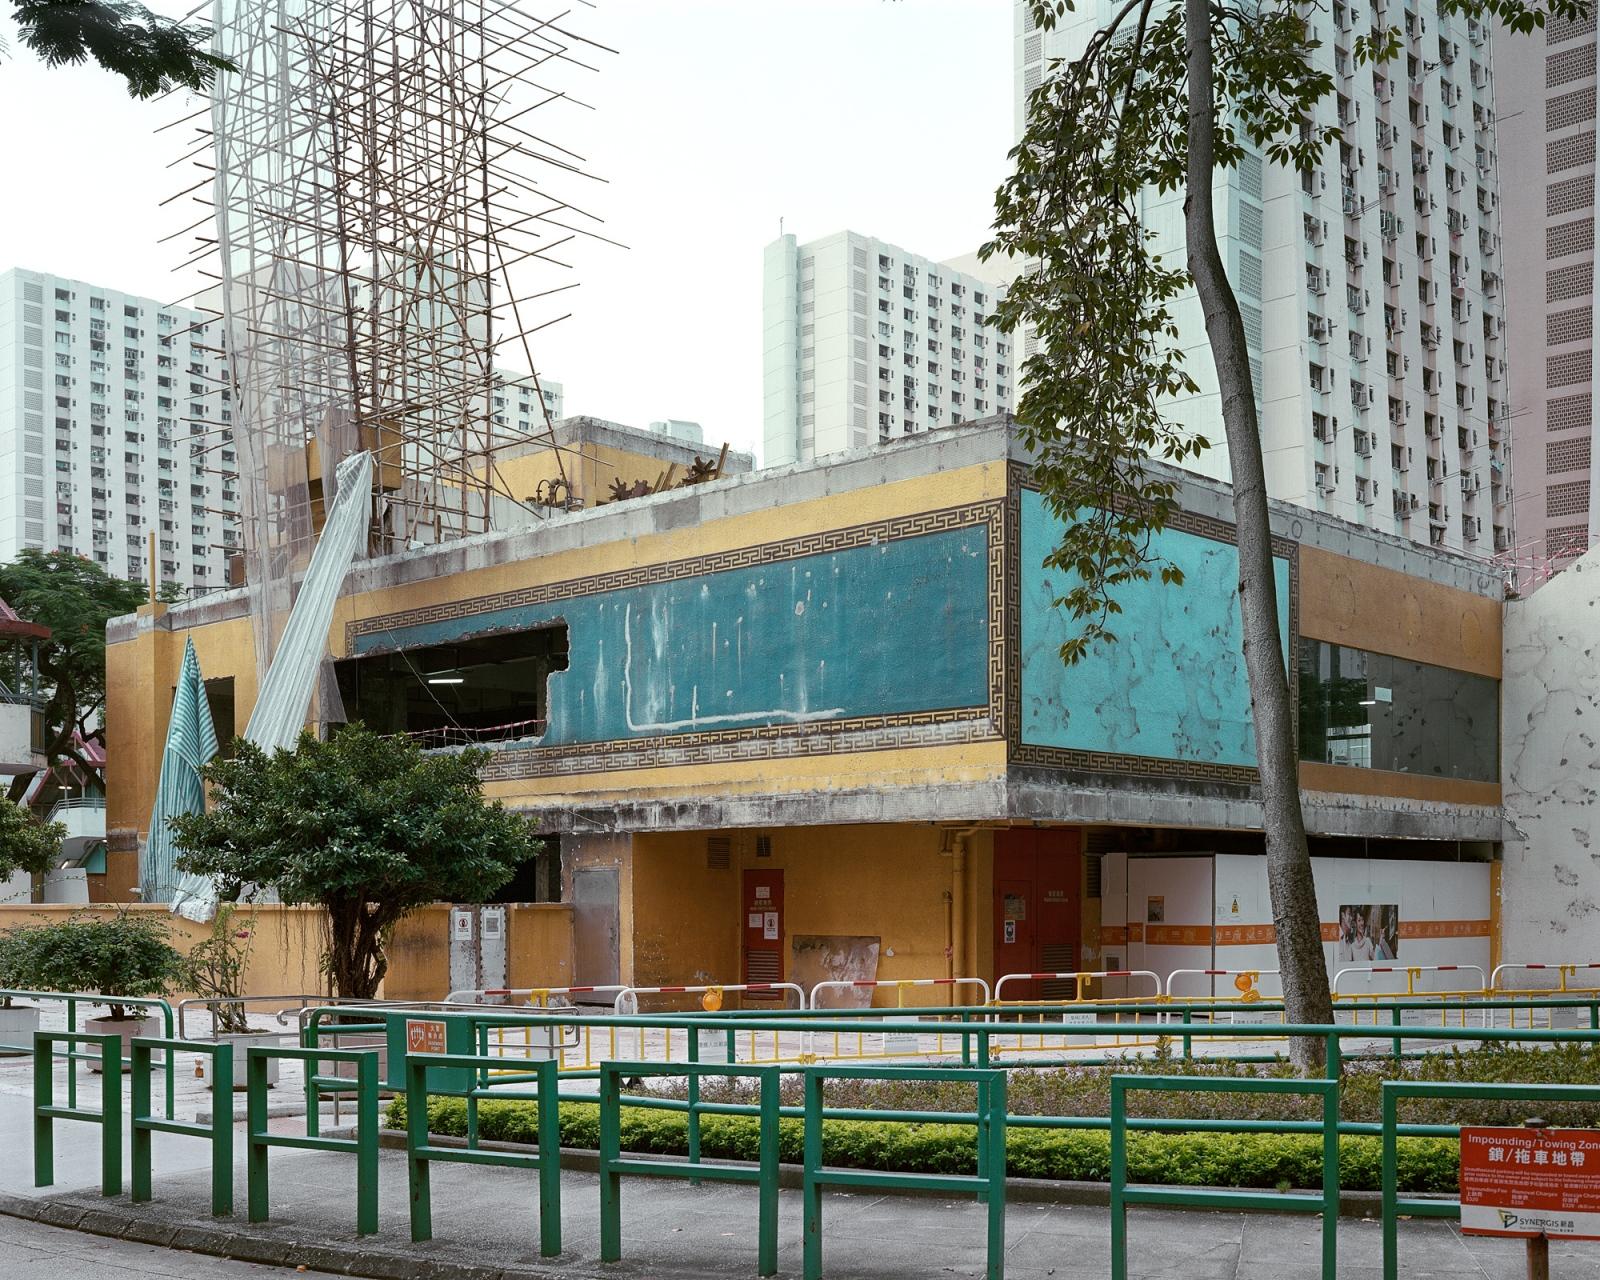 "Folded restaurant #2, Tai Hing Estate, 6/2012 Archival Pigment Inkjet Print 28.8"" x 36"" / 40"" x 50"""